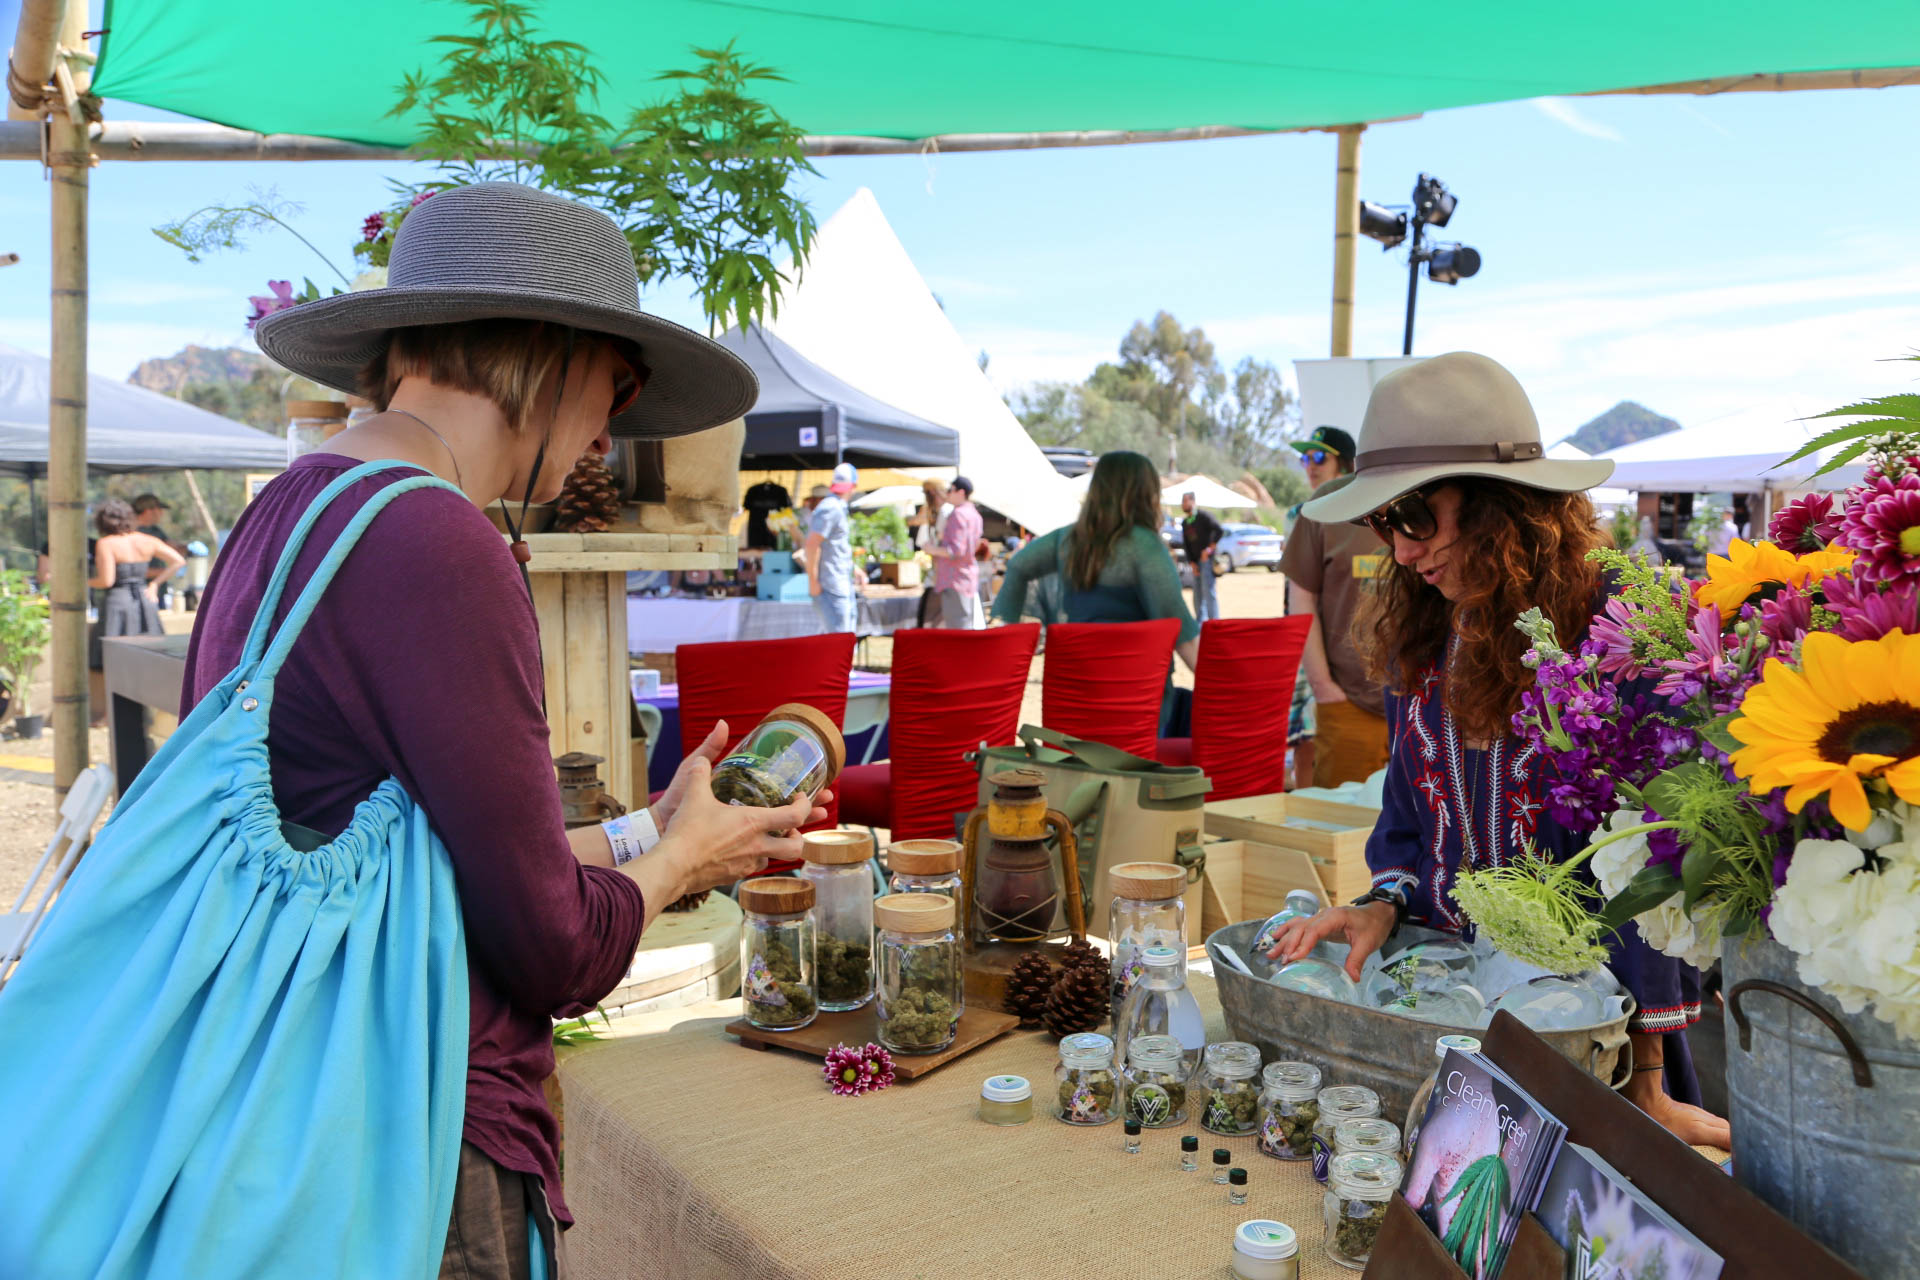 Exploring the Farmer's Market